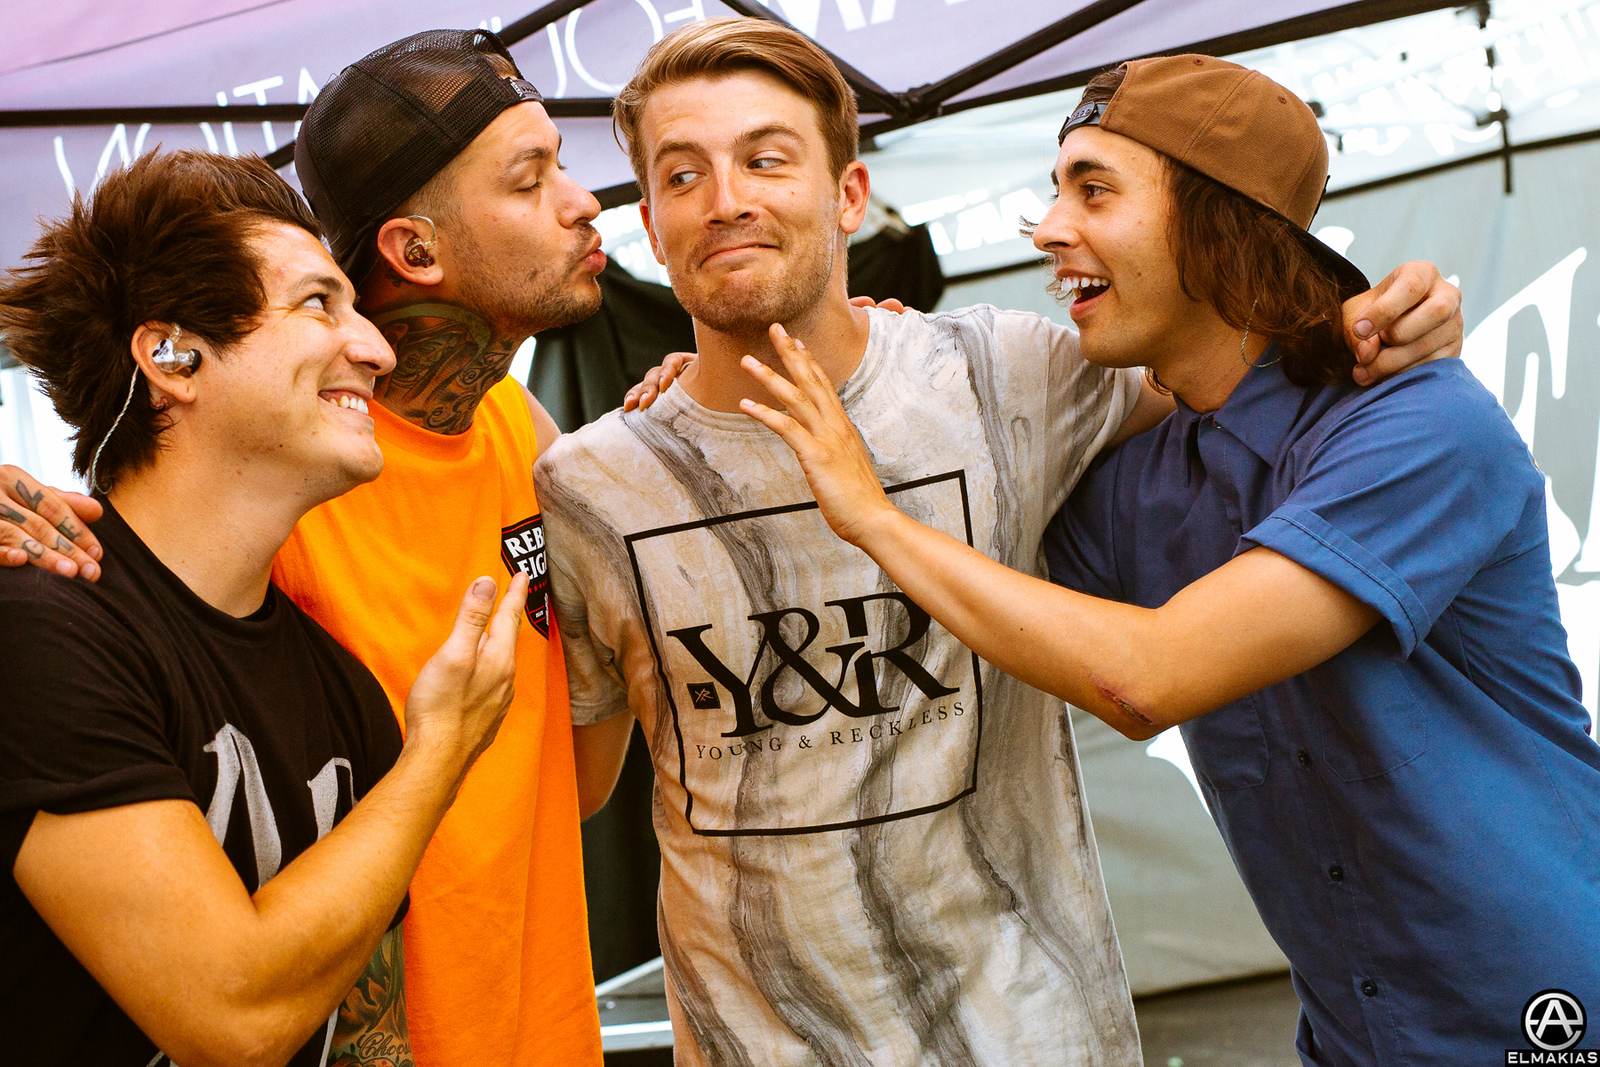 Jaime Preciado, Mike Fuentes, Trenton Woodley of Hands Like Houses , Vic Fuentes at Warped Tour 2015